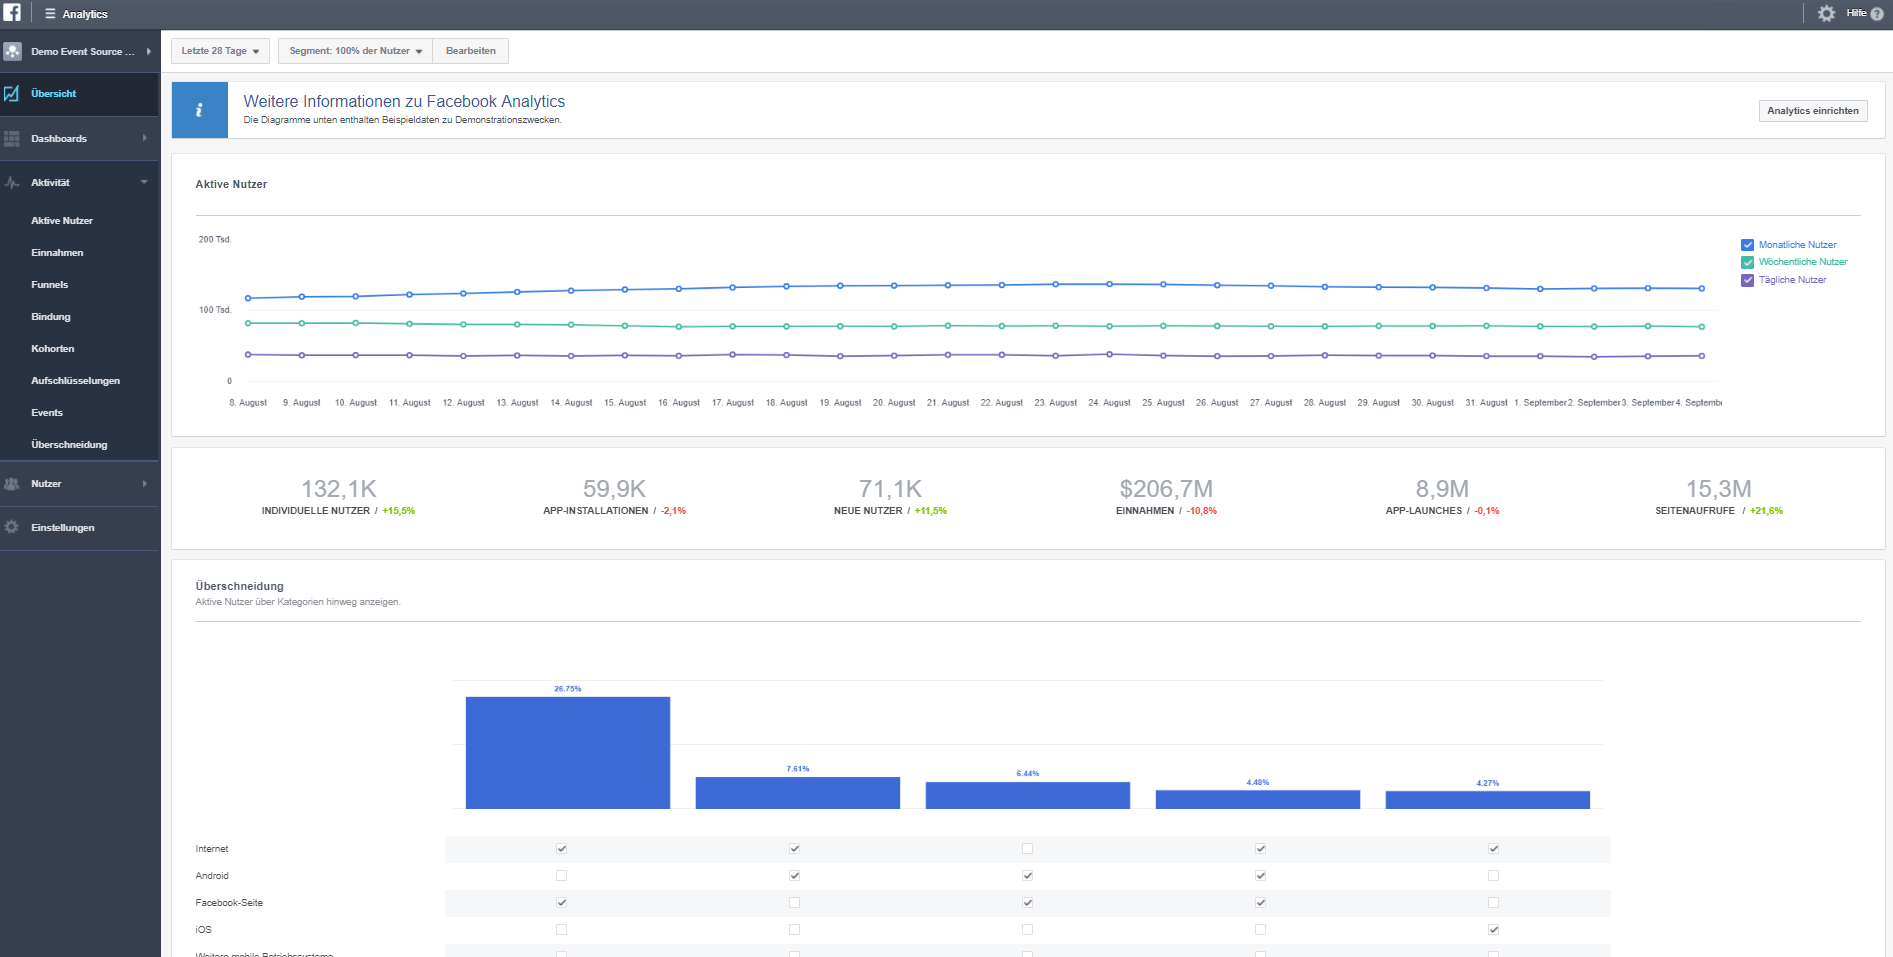 facebook-analytics-social-media-tools.png